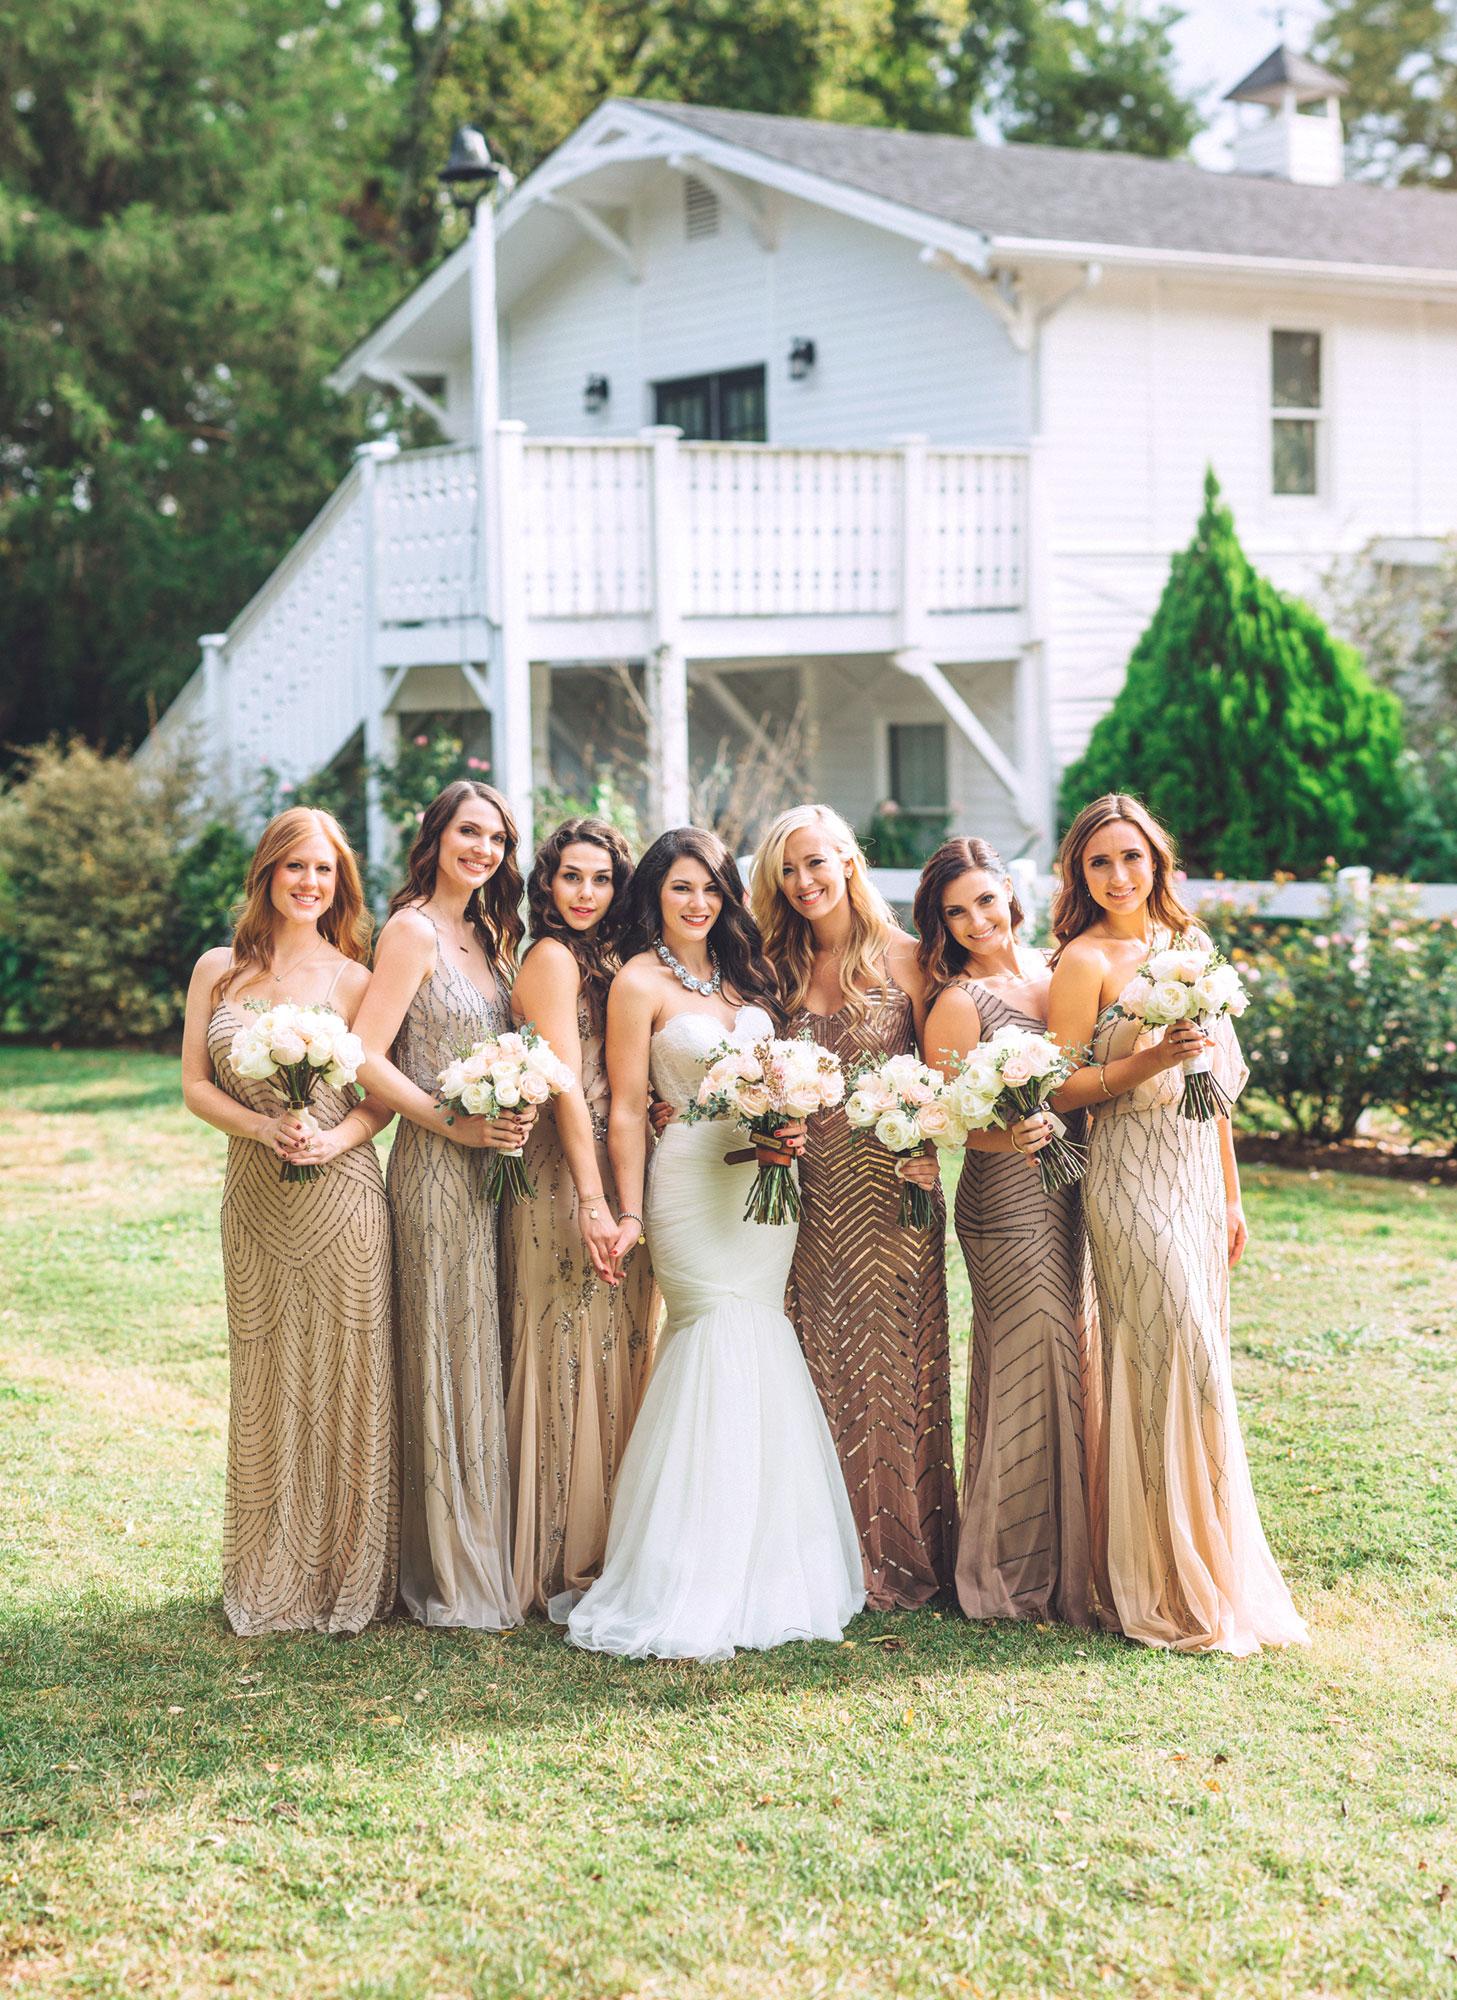 Me & Mr. Jones Wedding, Black Tie Wedding, Bridesmaids wearing Adrianna Papell Beaded Dresses, Embellished Bridesmaids Dresses, Black Tie Wedding, Blush Bridesmaids